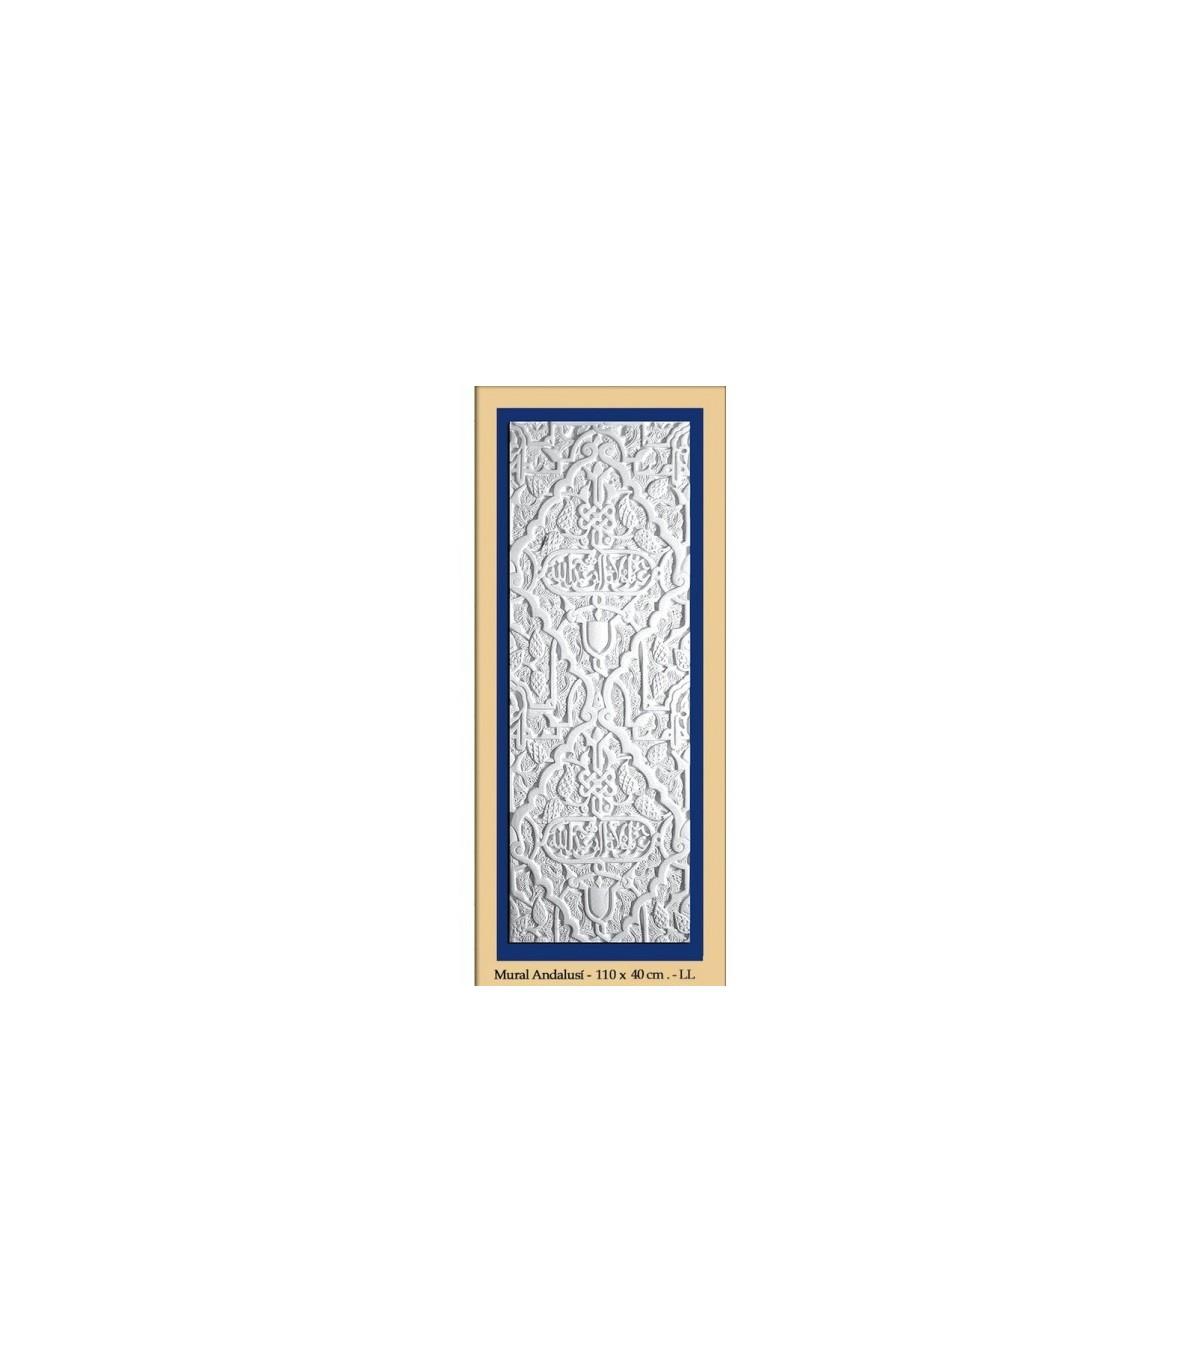 andalusische wand - putz - 110 x 40 cm